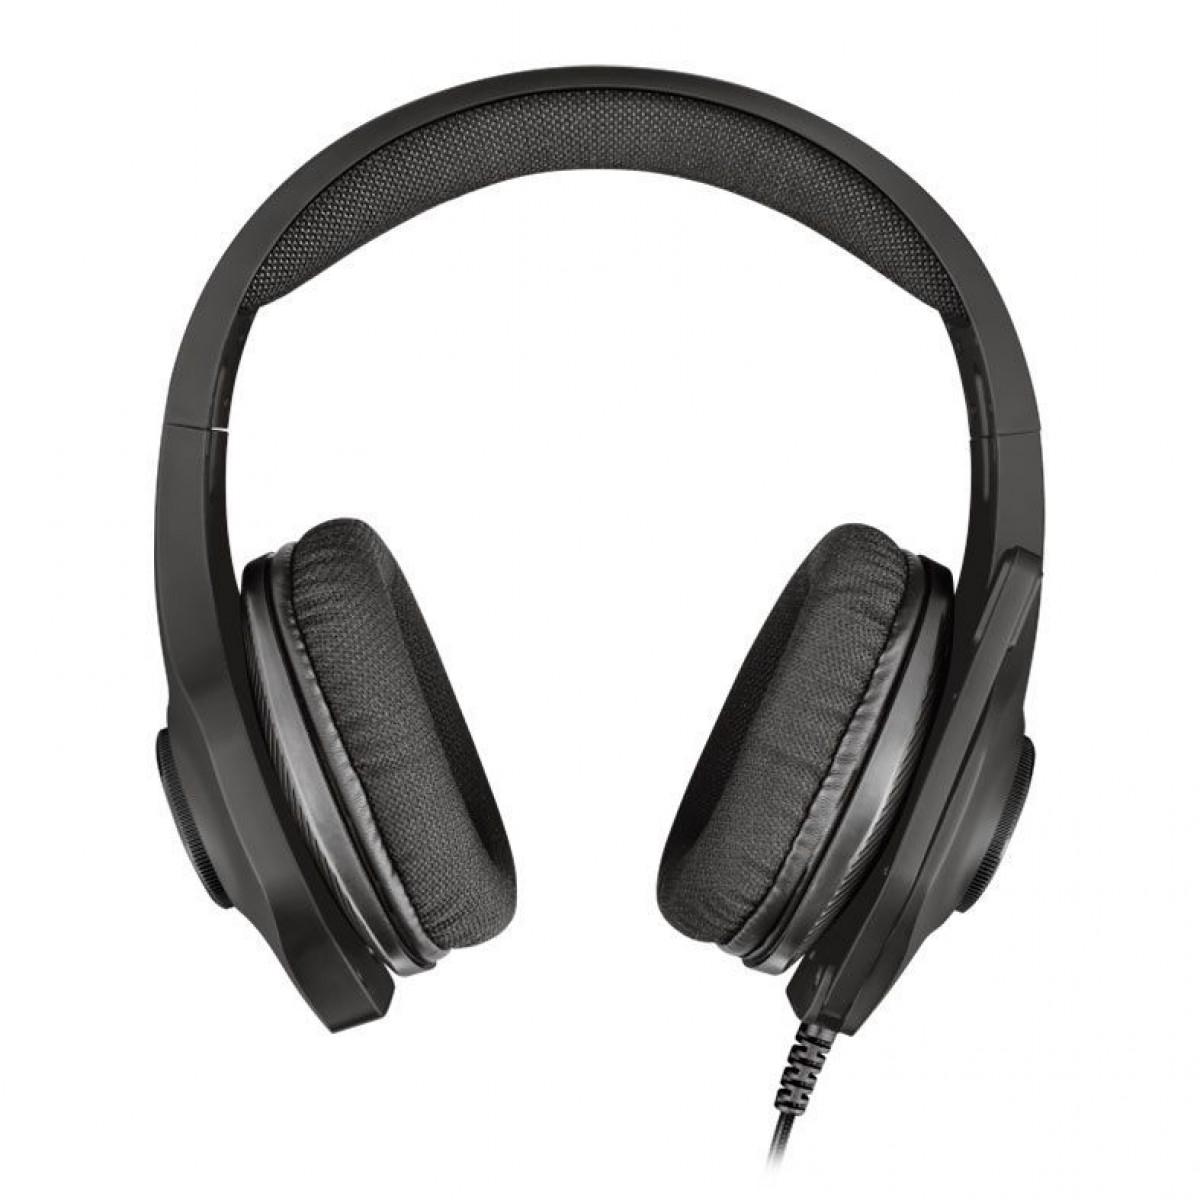 Headset Gamer Trust Tourus RGB, Black, T23138